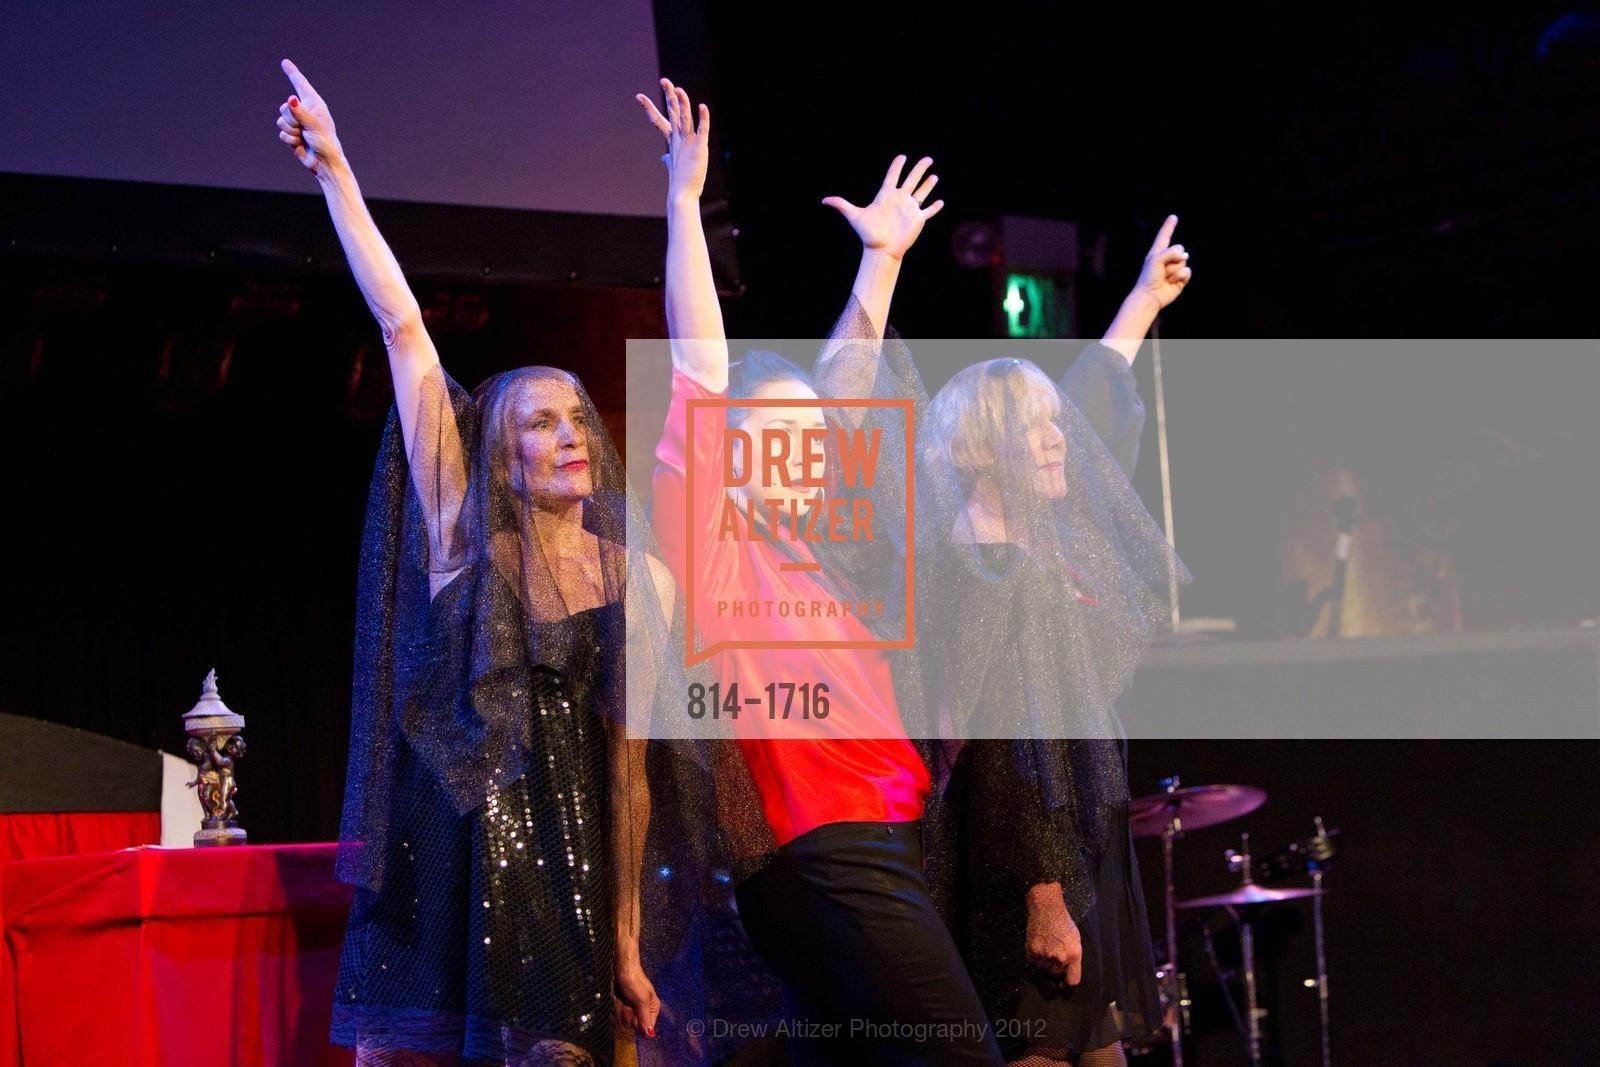 Performance, Photo #814-1716